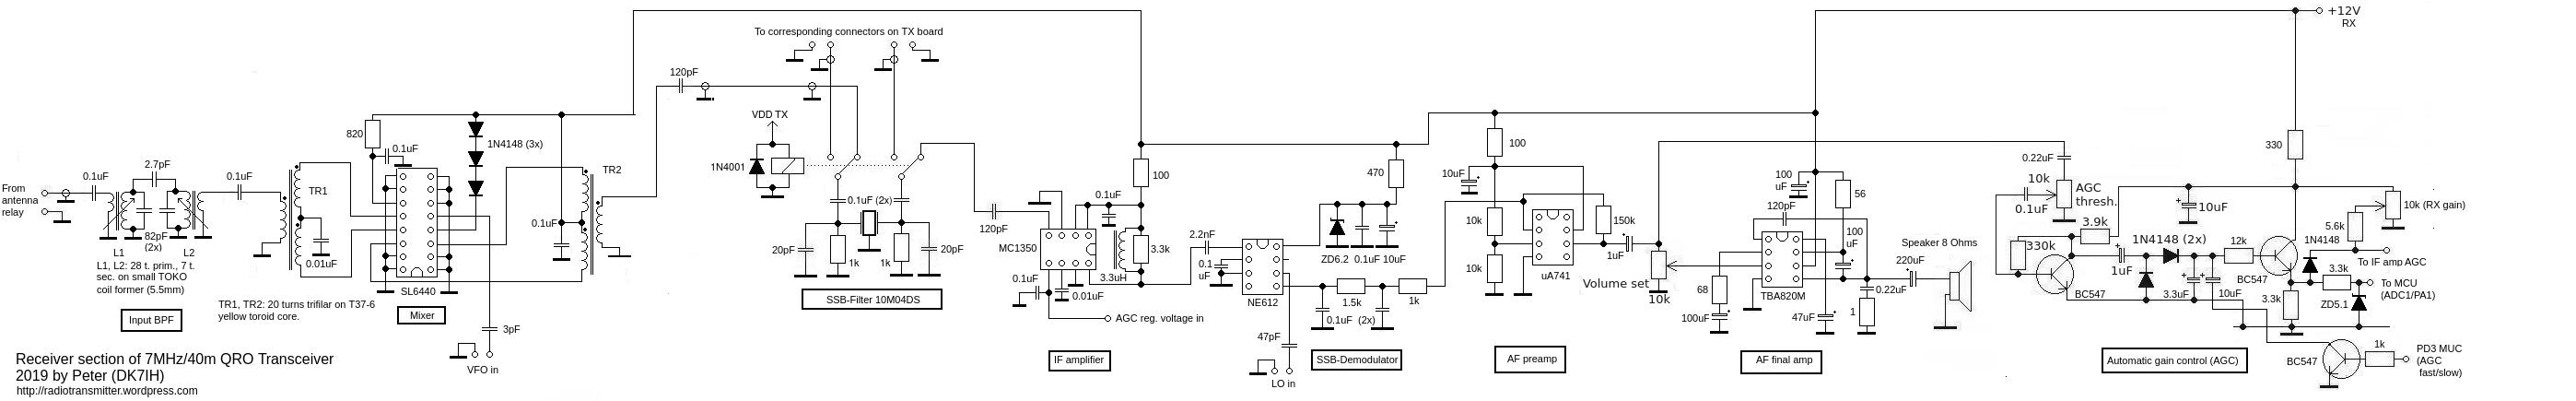 DK7IH 7MHz QRO SSB transceiver - Receiver section (Version 2)